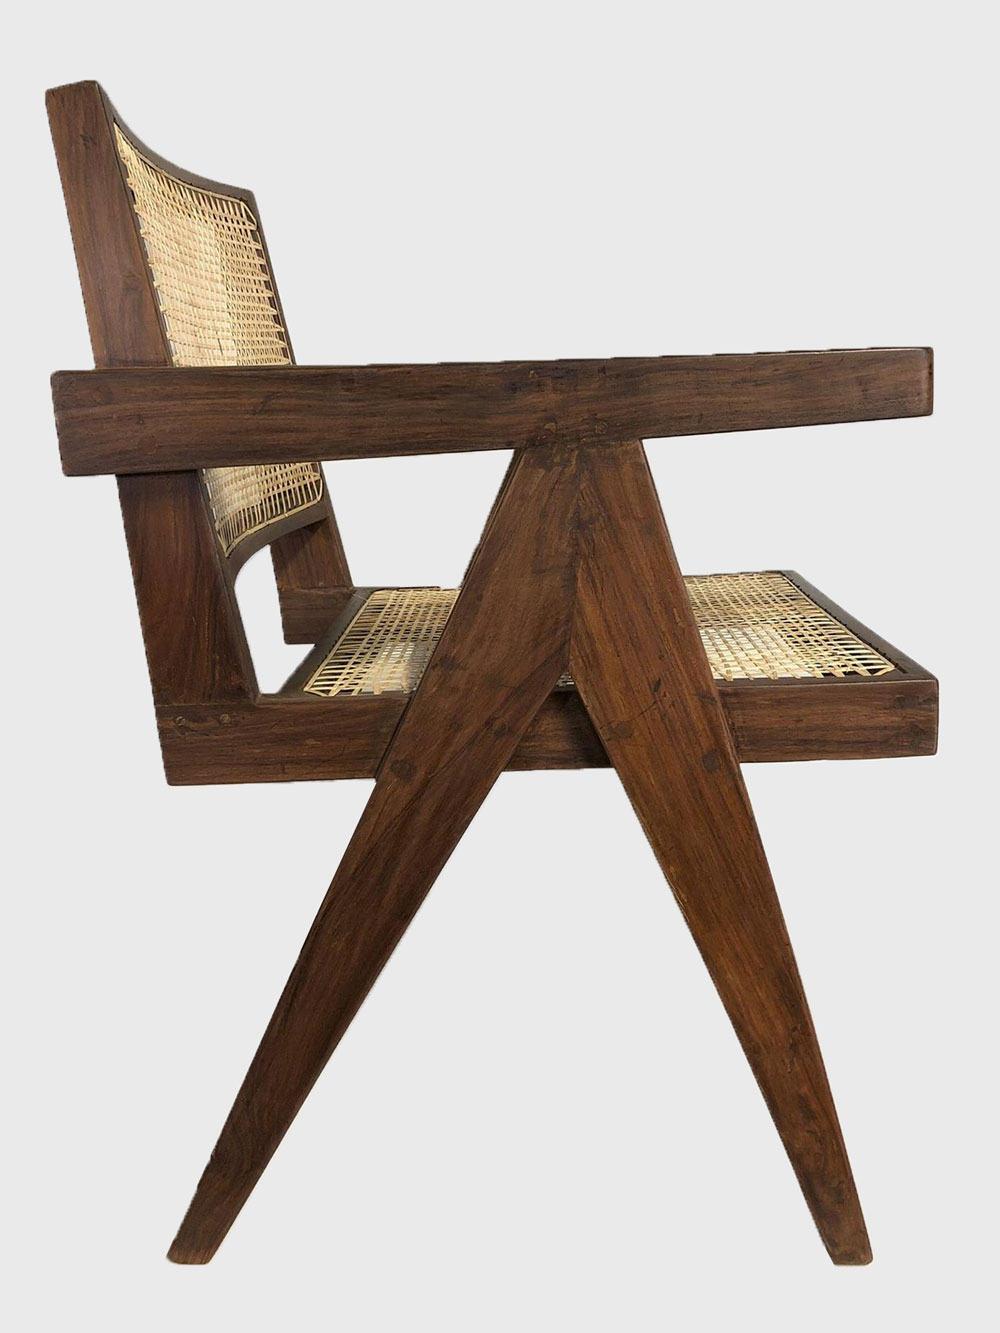 Stupendous Pierre Jeanneret Office Chair Rhoko Rare Mid Century Modern Andrewgaddart Wooden Chair Designs For Living Room Andrewgaddartcom